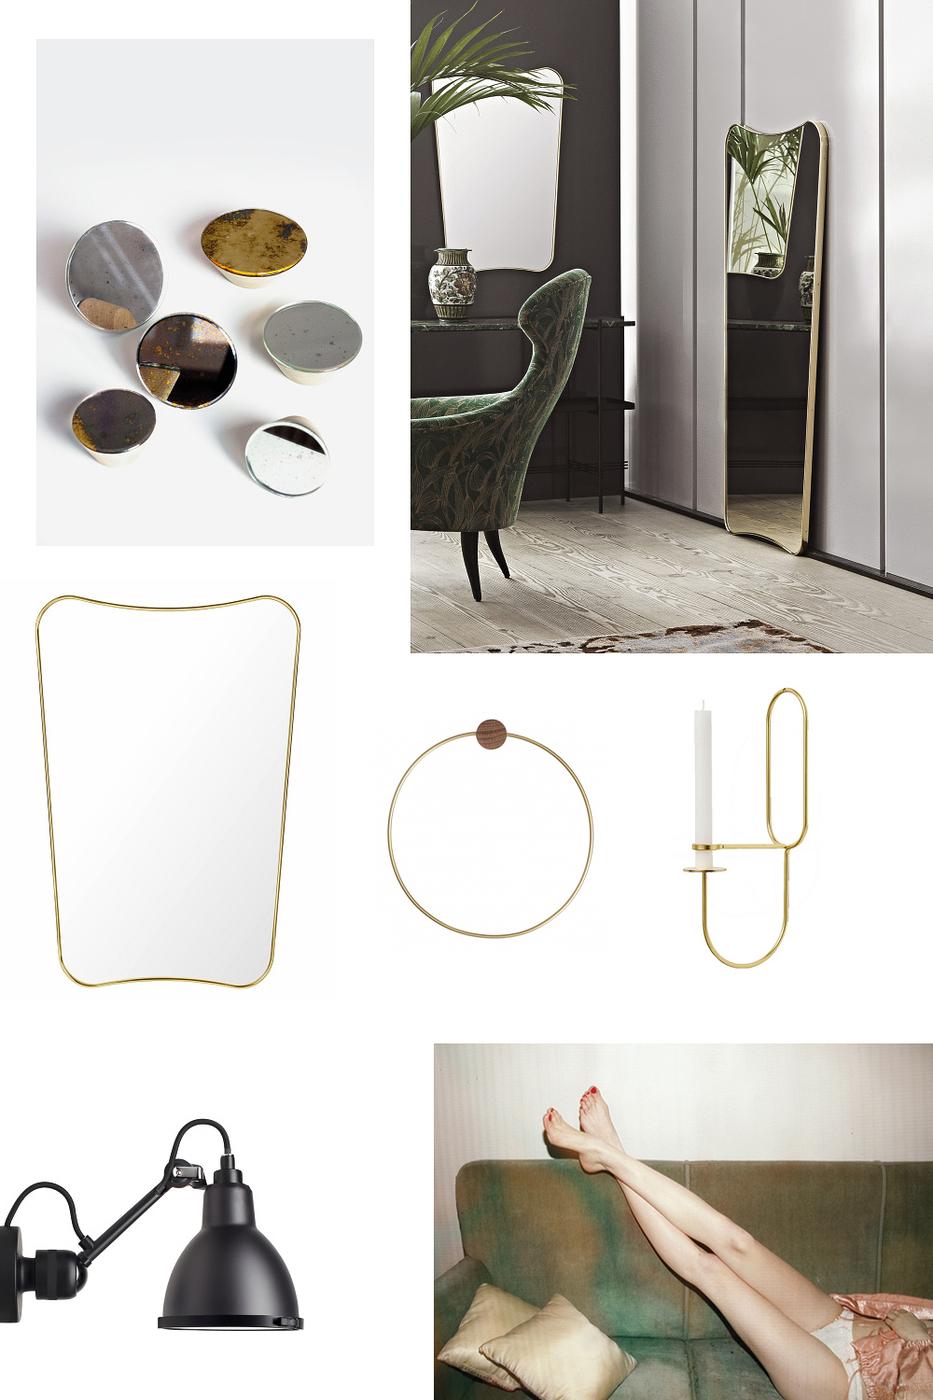 Kylpyhuoneeseen / Bathroom details